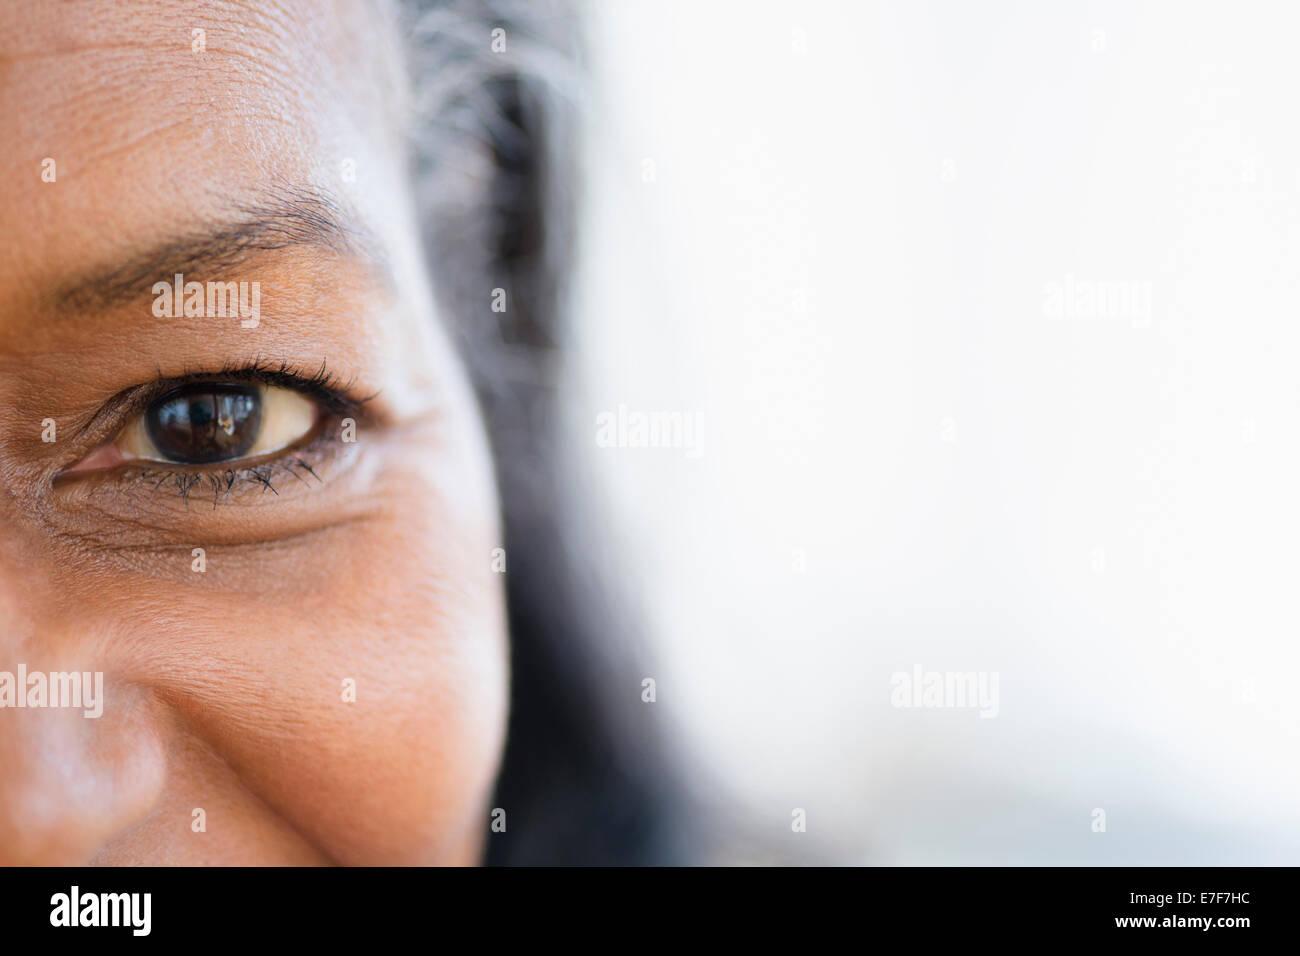 Close up of mixed race woman's eye Stock Photo